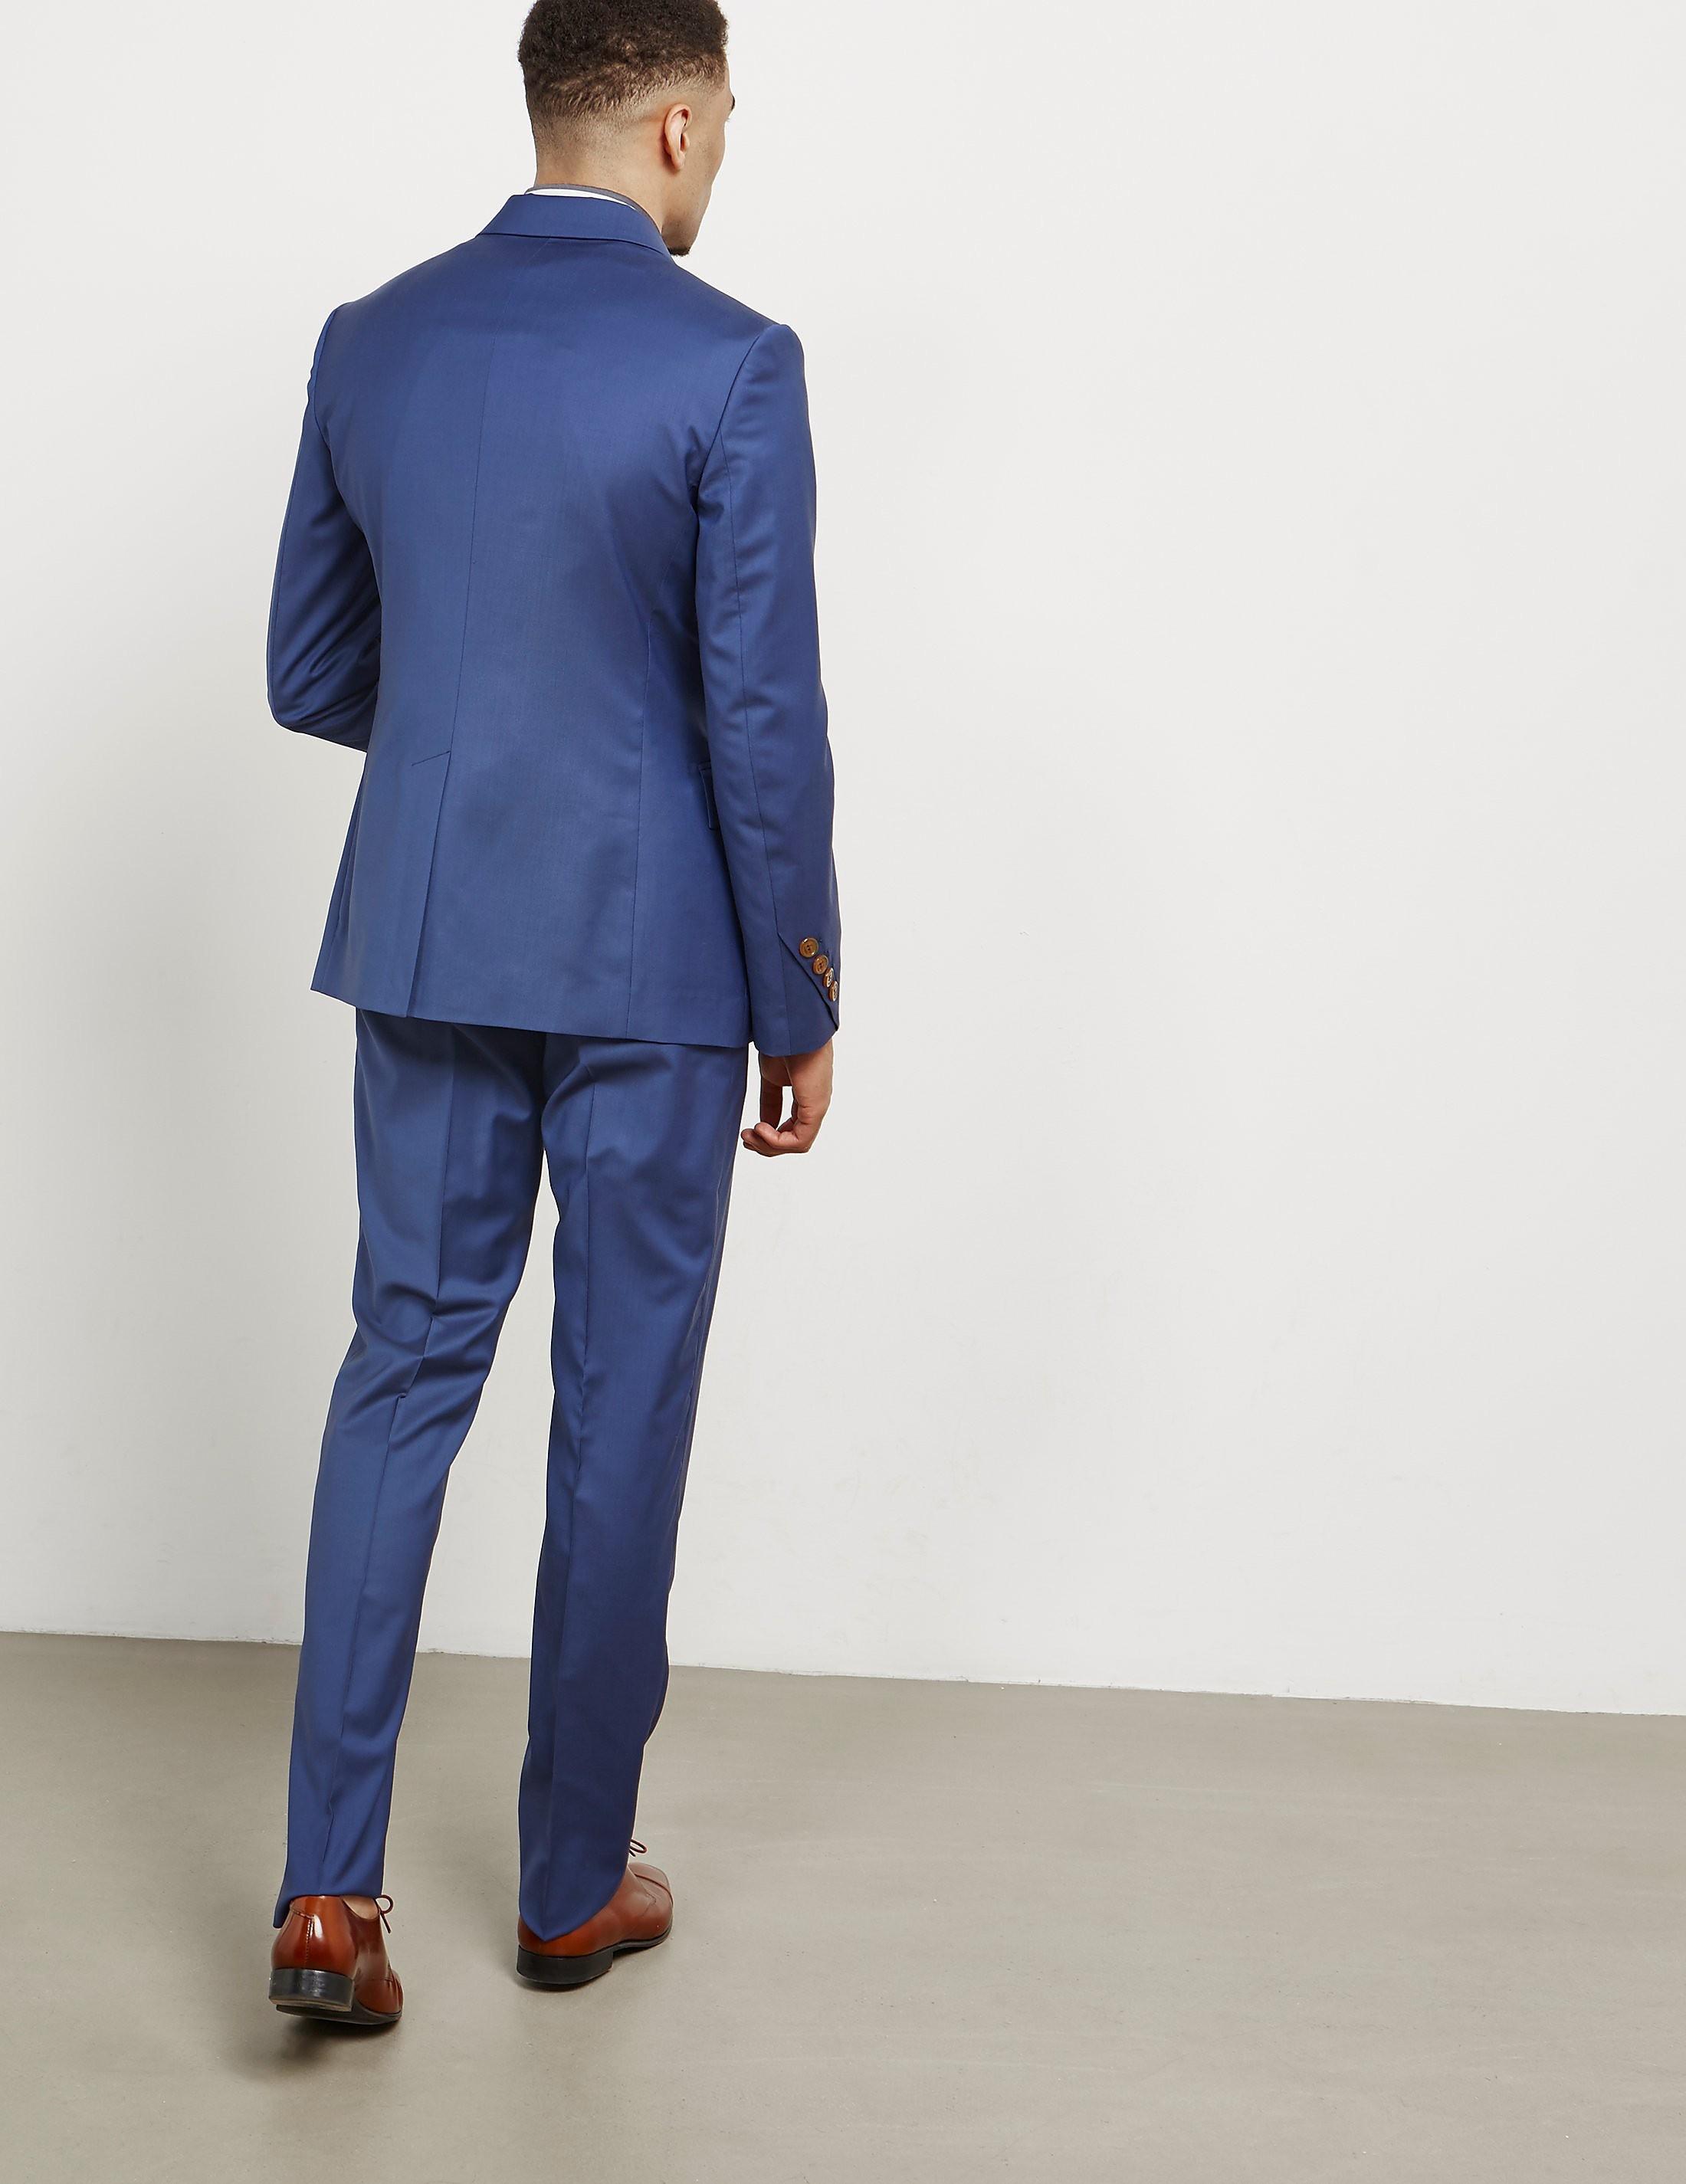 Vivienne Westwood James Suit - Online Exclusive